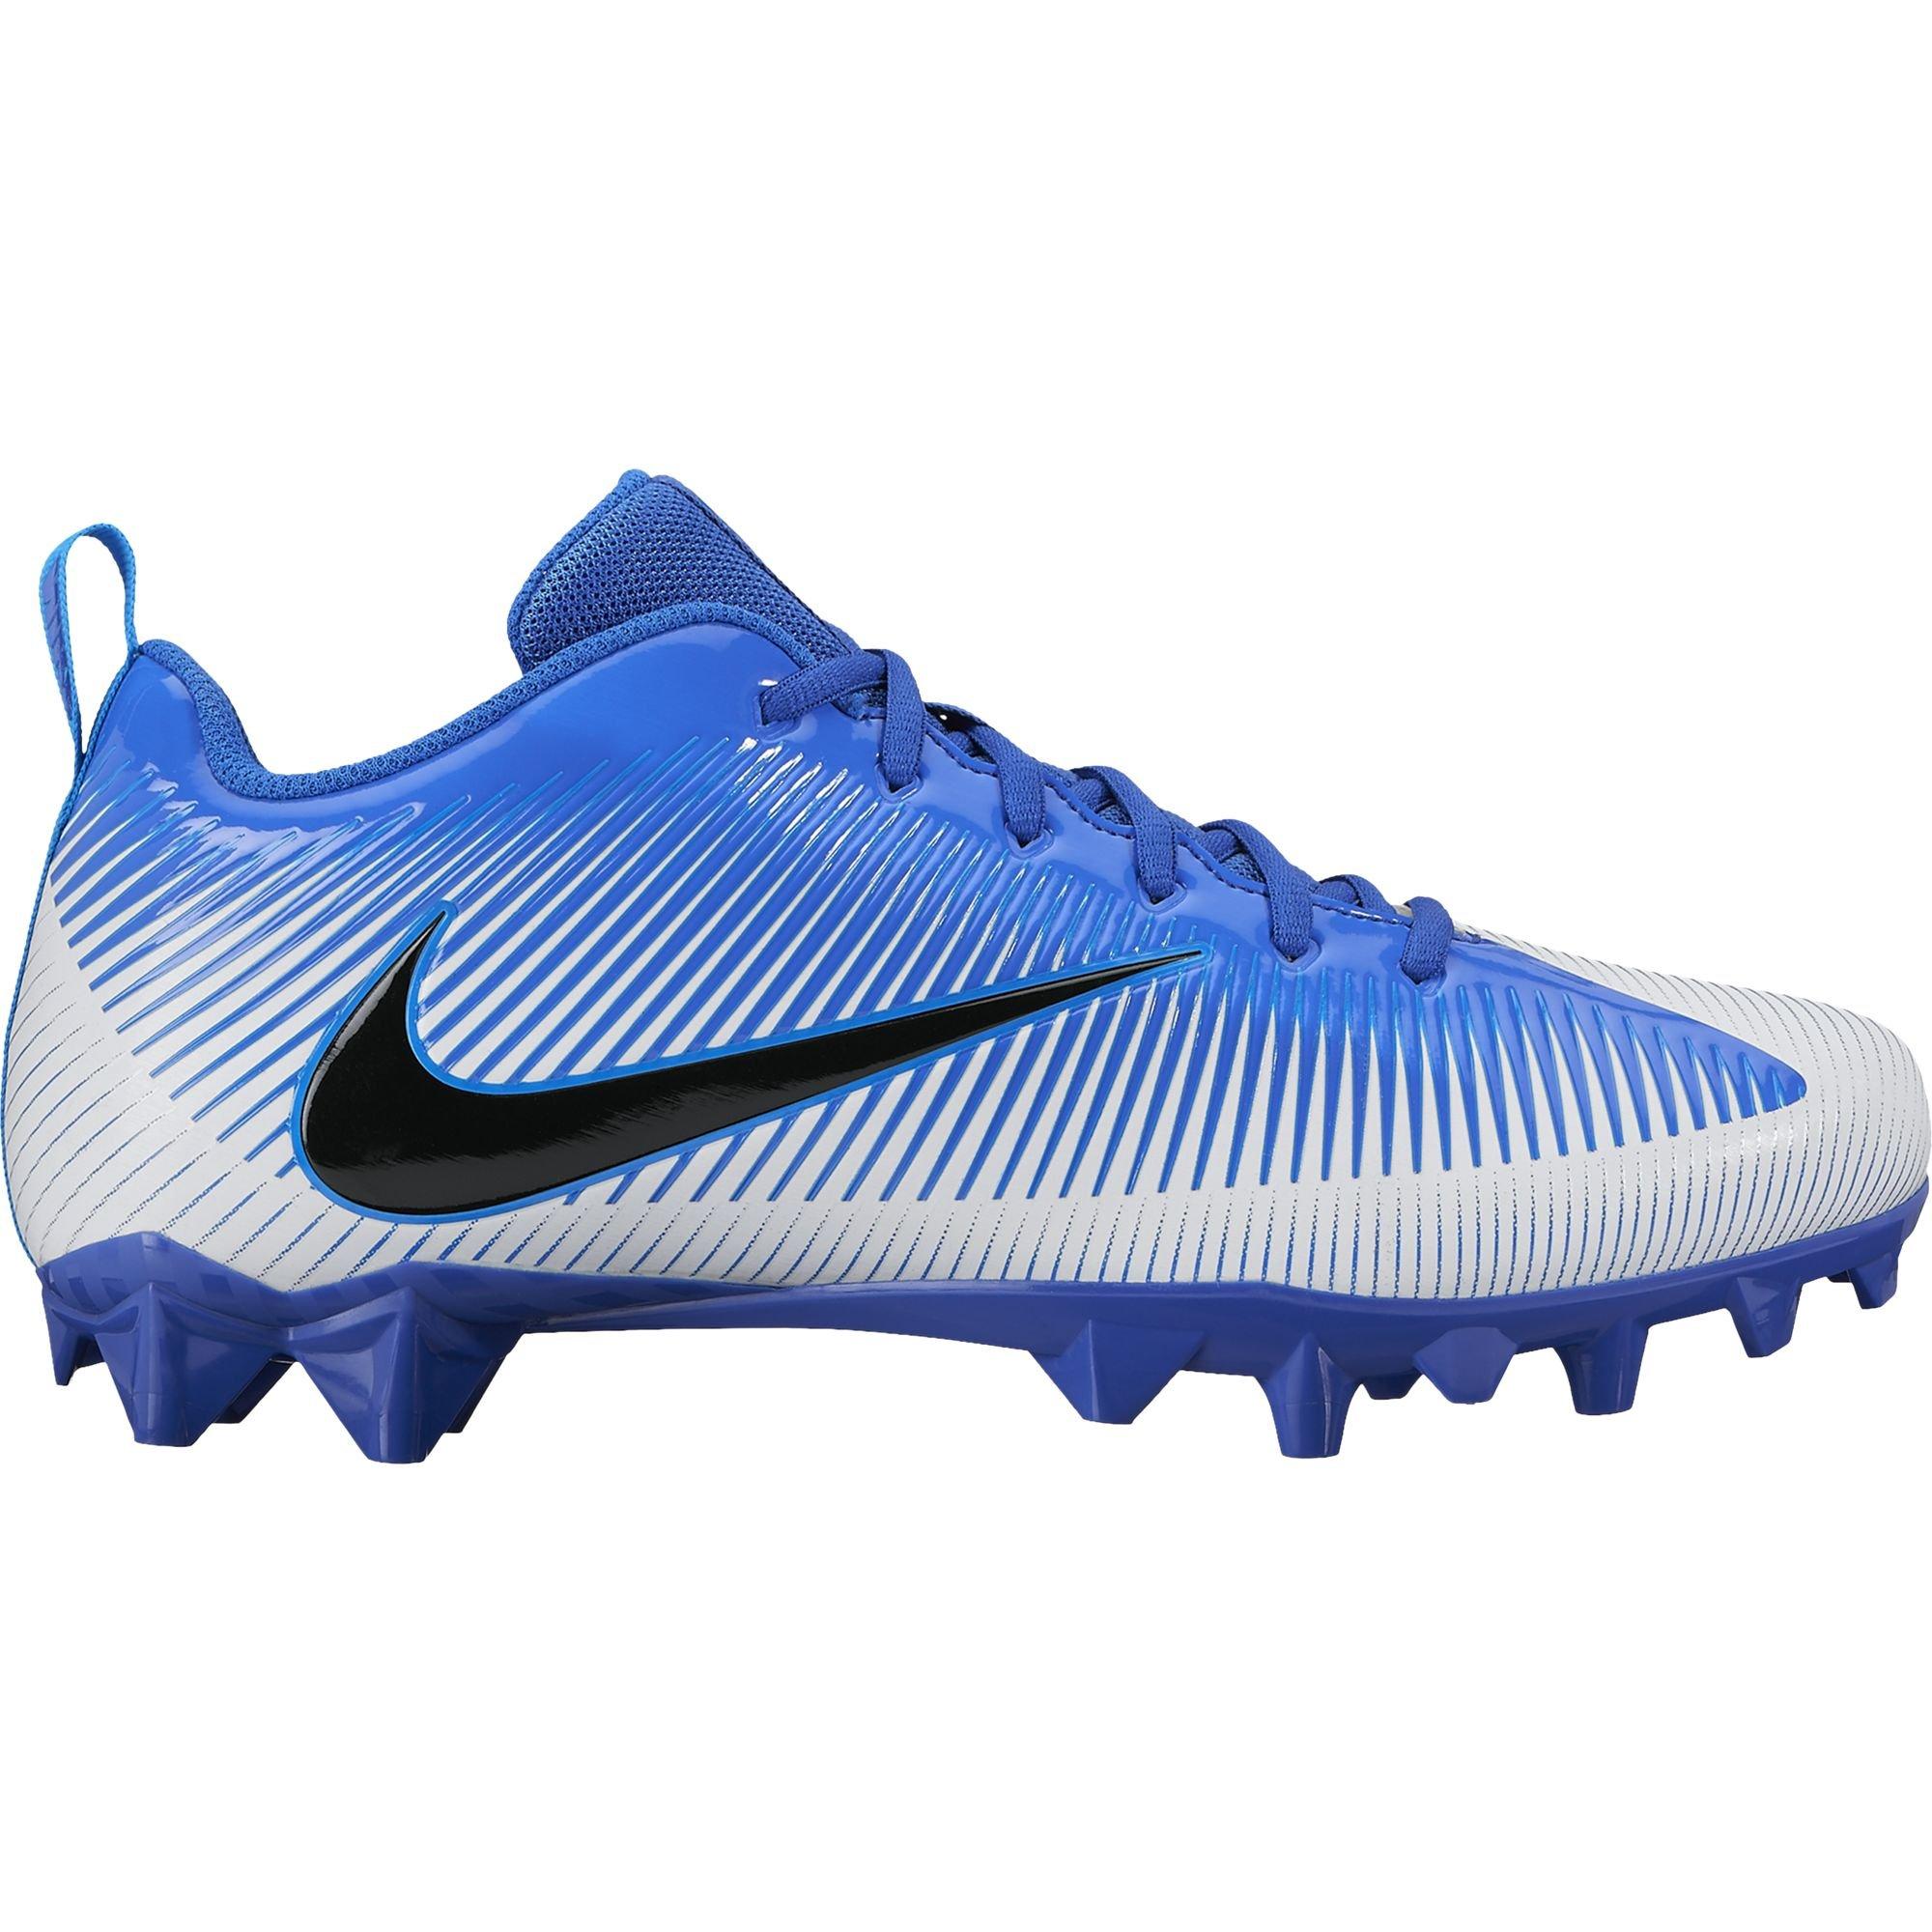 a1ac3c78b Galleon - Nike Men s Vapor Strike 5 TD Football Cleat Racer Blue White Black  Size 10.5 M US